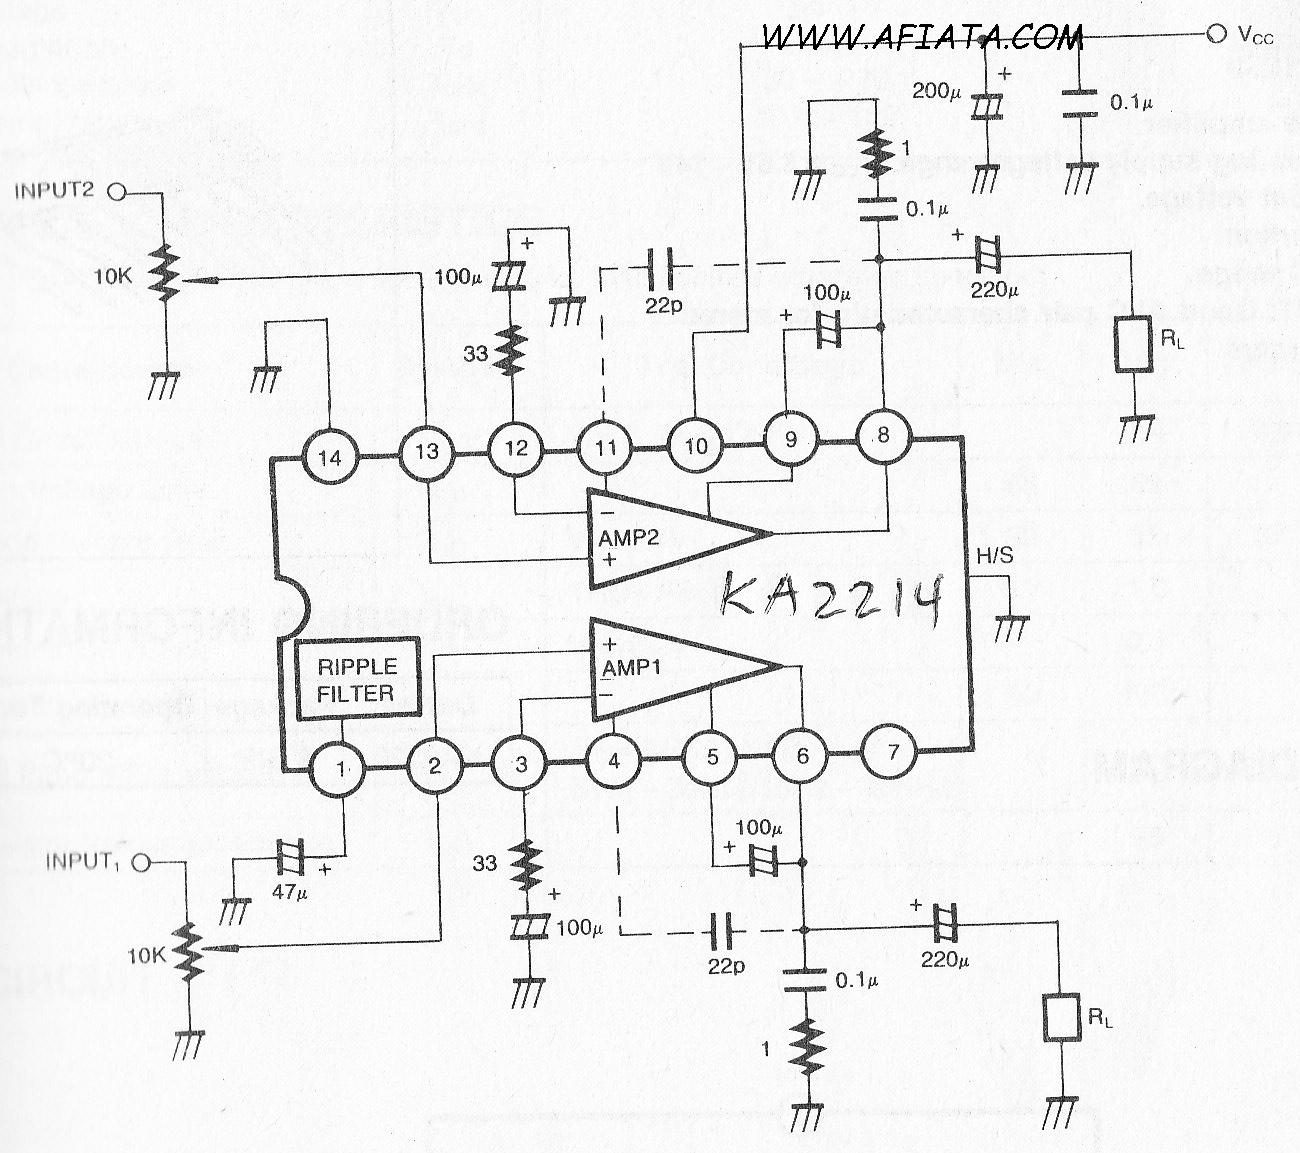 221512w dual power amplifier with ka2214